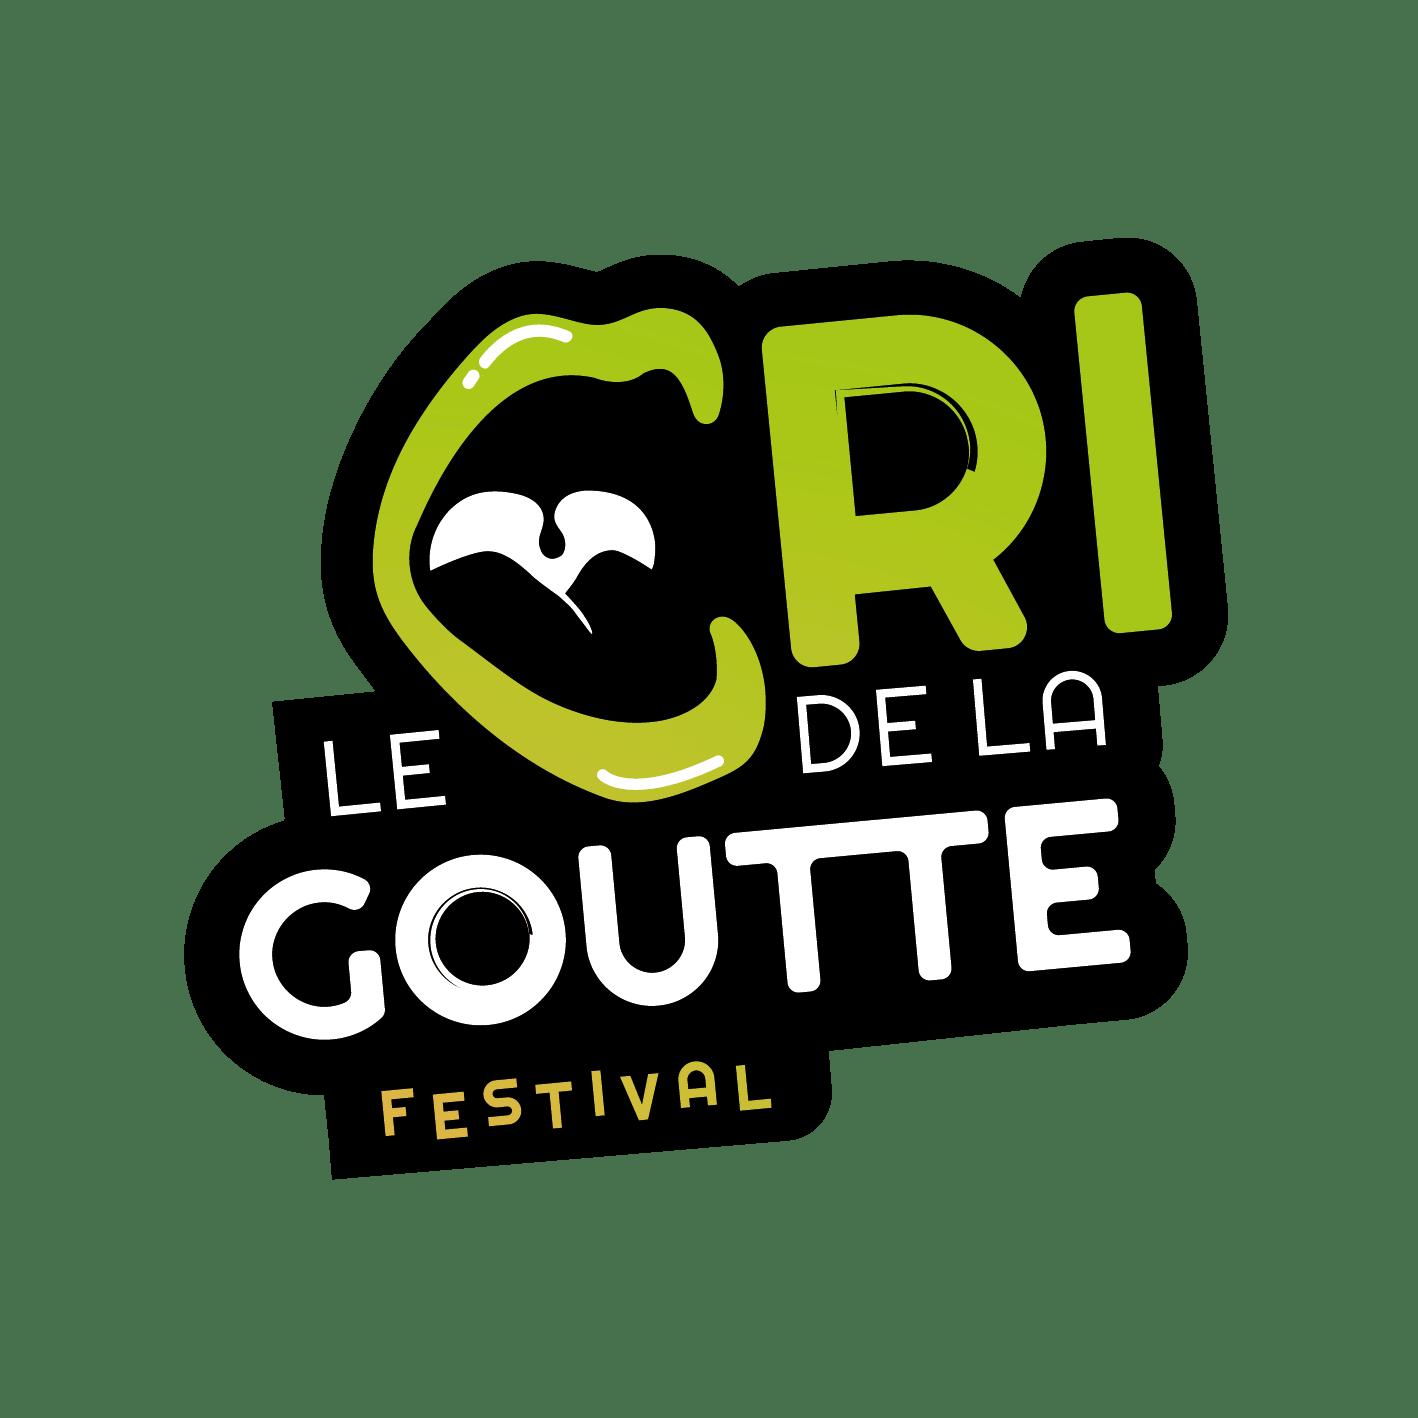 Logo Festivall Le Cri de la Goutte